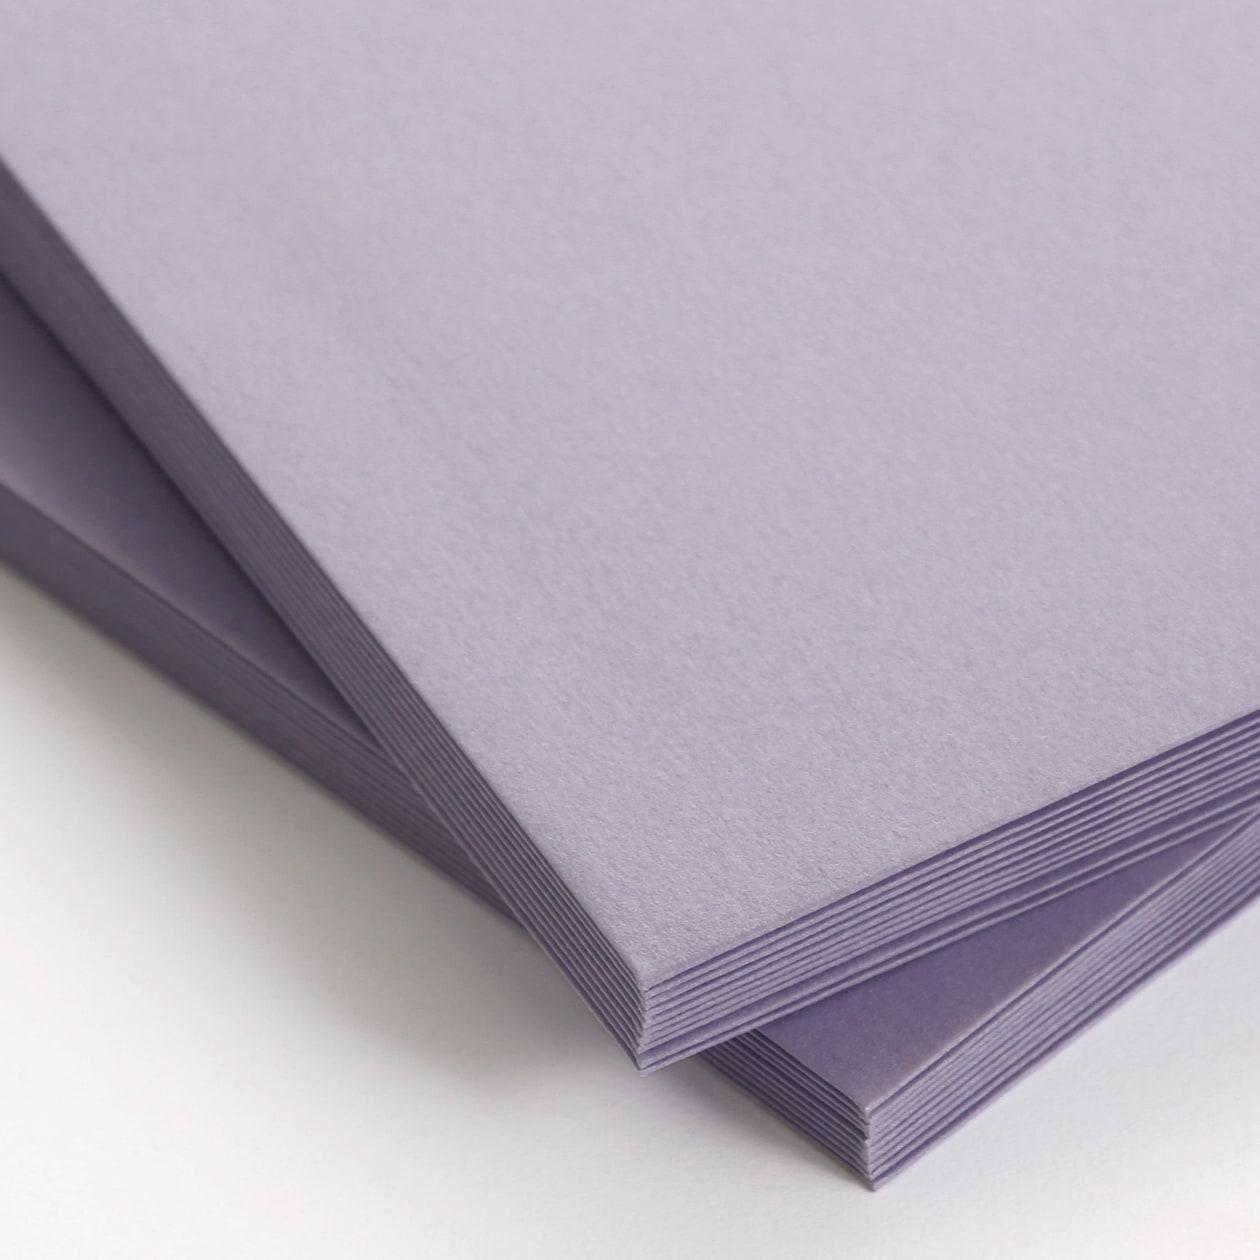 NEカマス封筒 コットン(NTラシャ) うす藤紫 116.3g